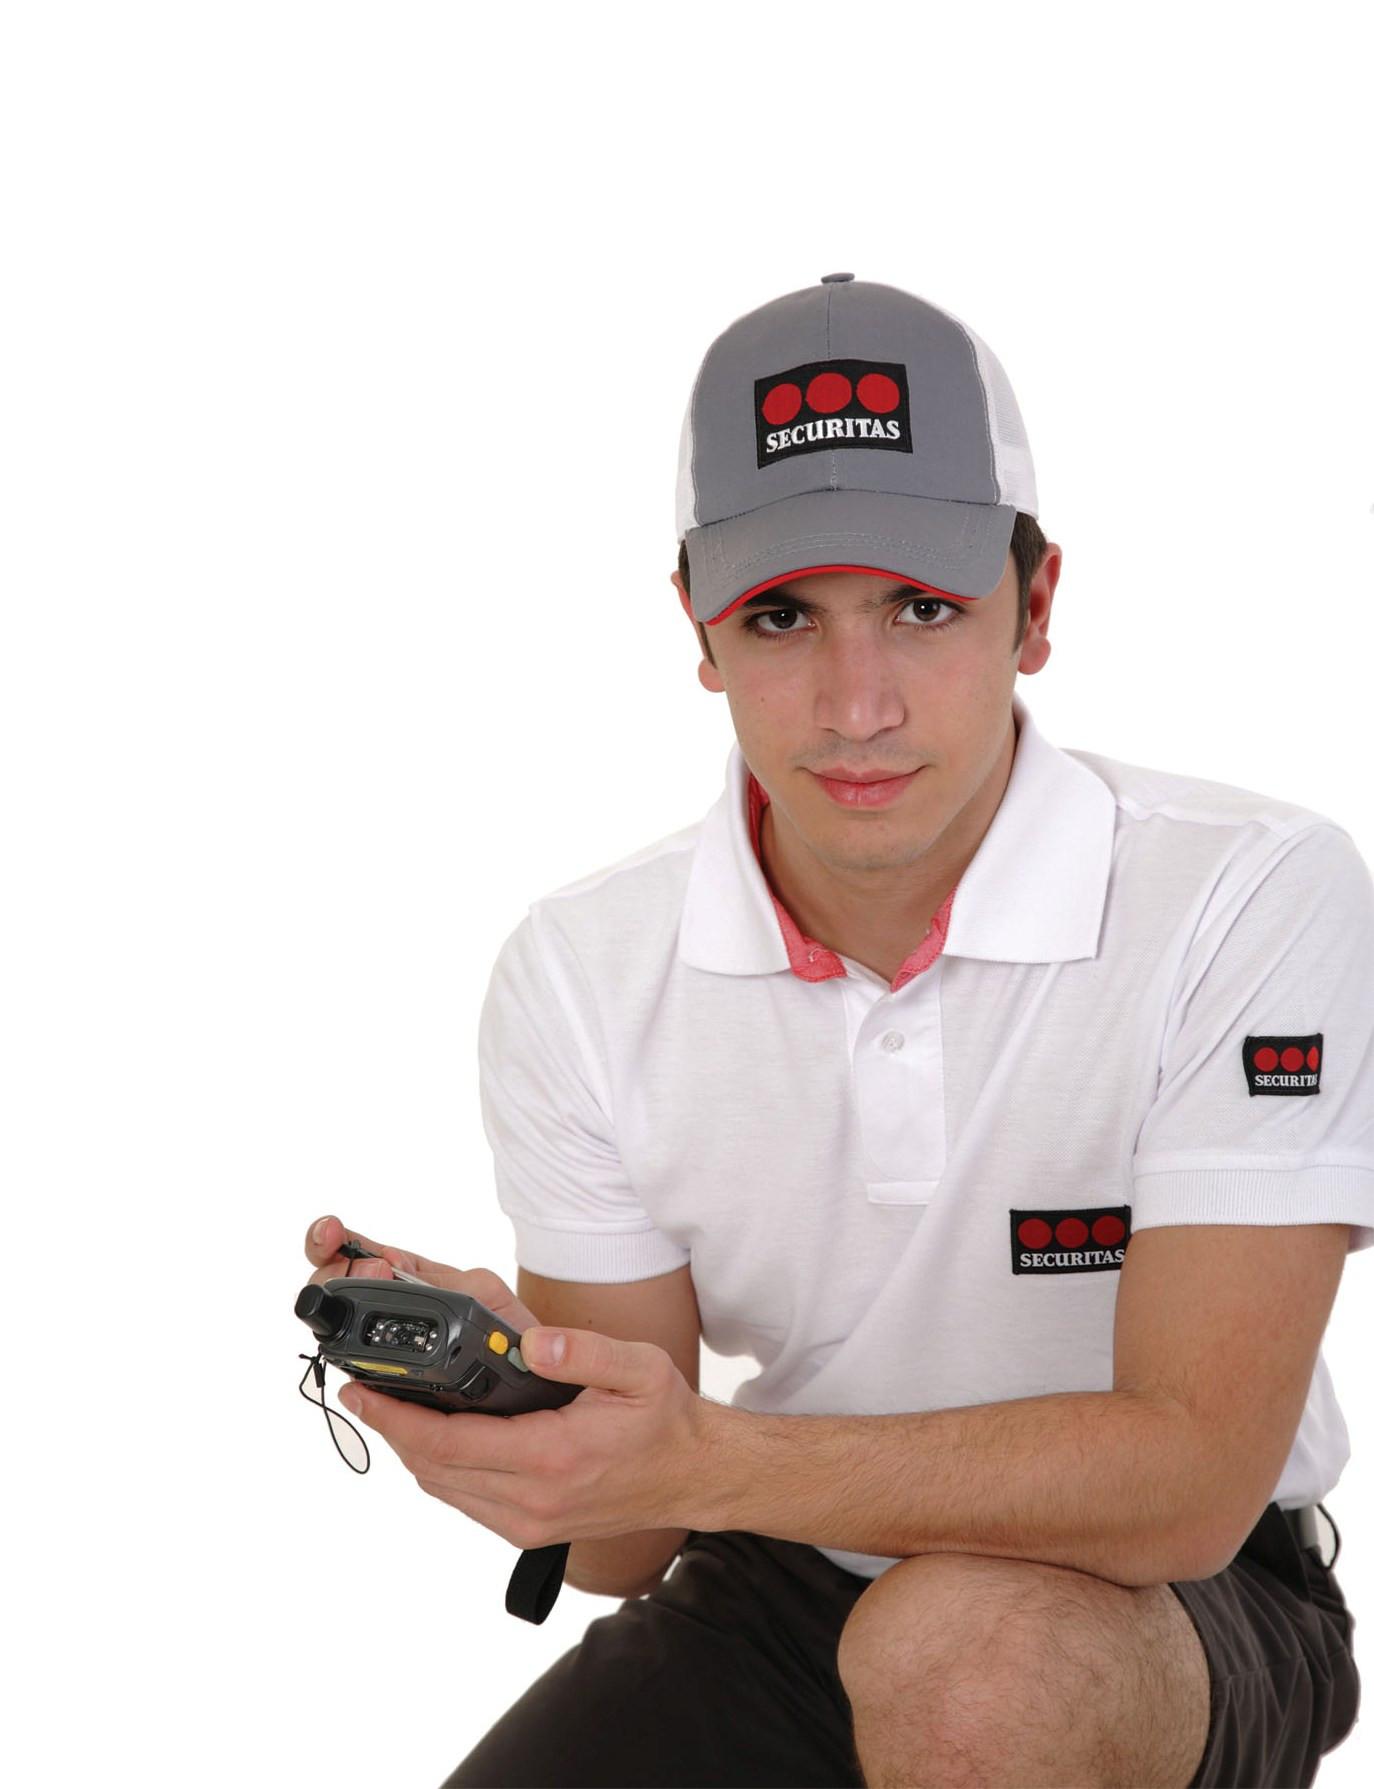 1334421287_securitas-uniforms-studio-9184.jpg